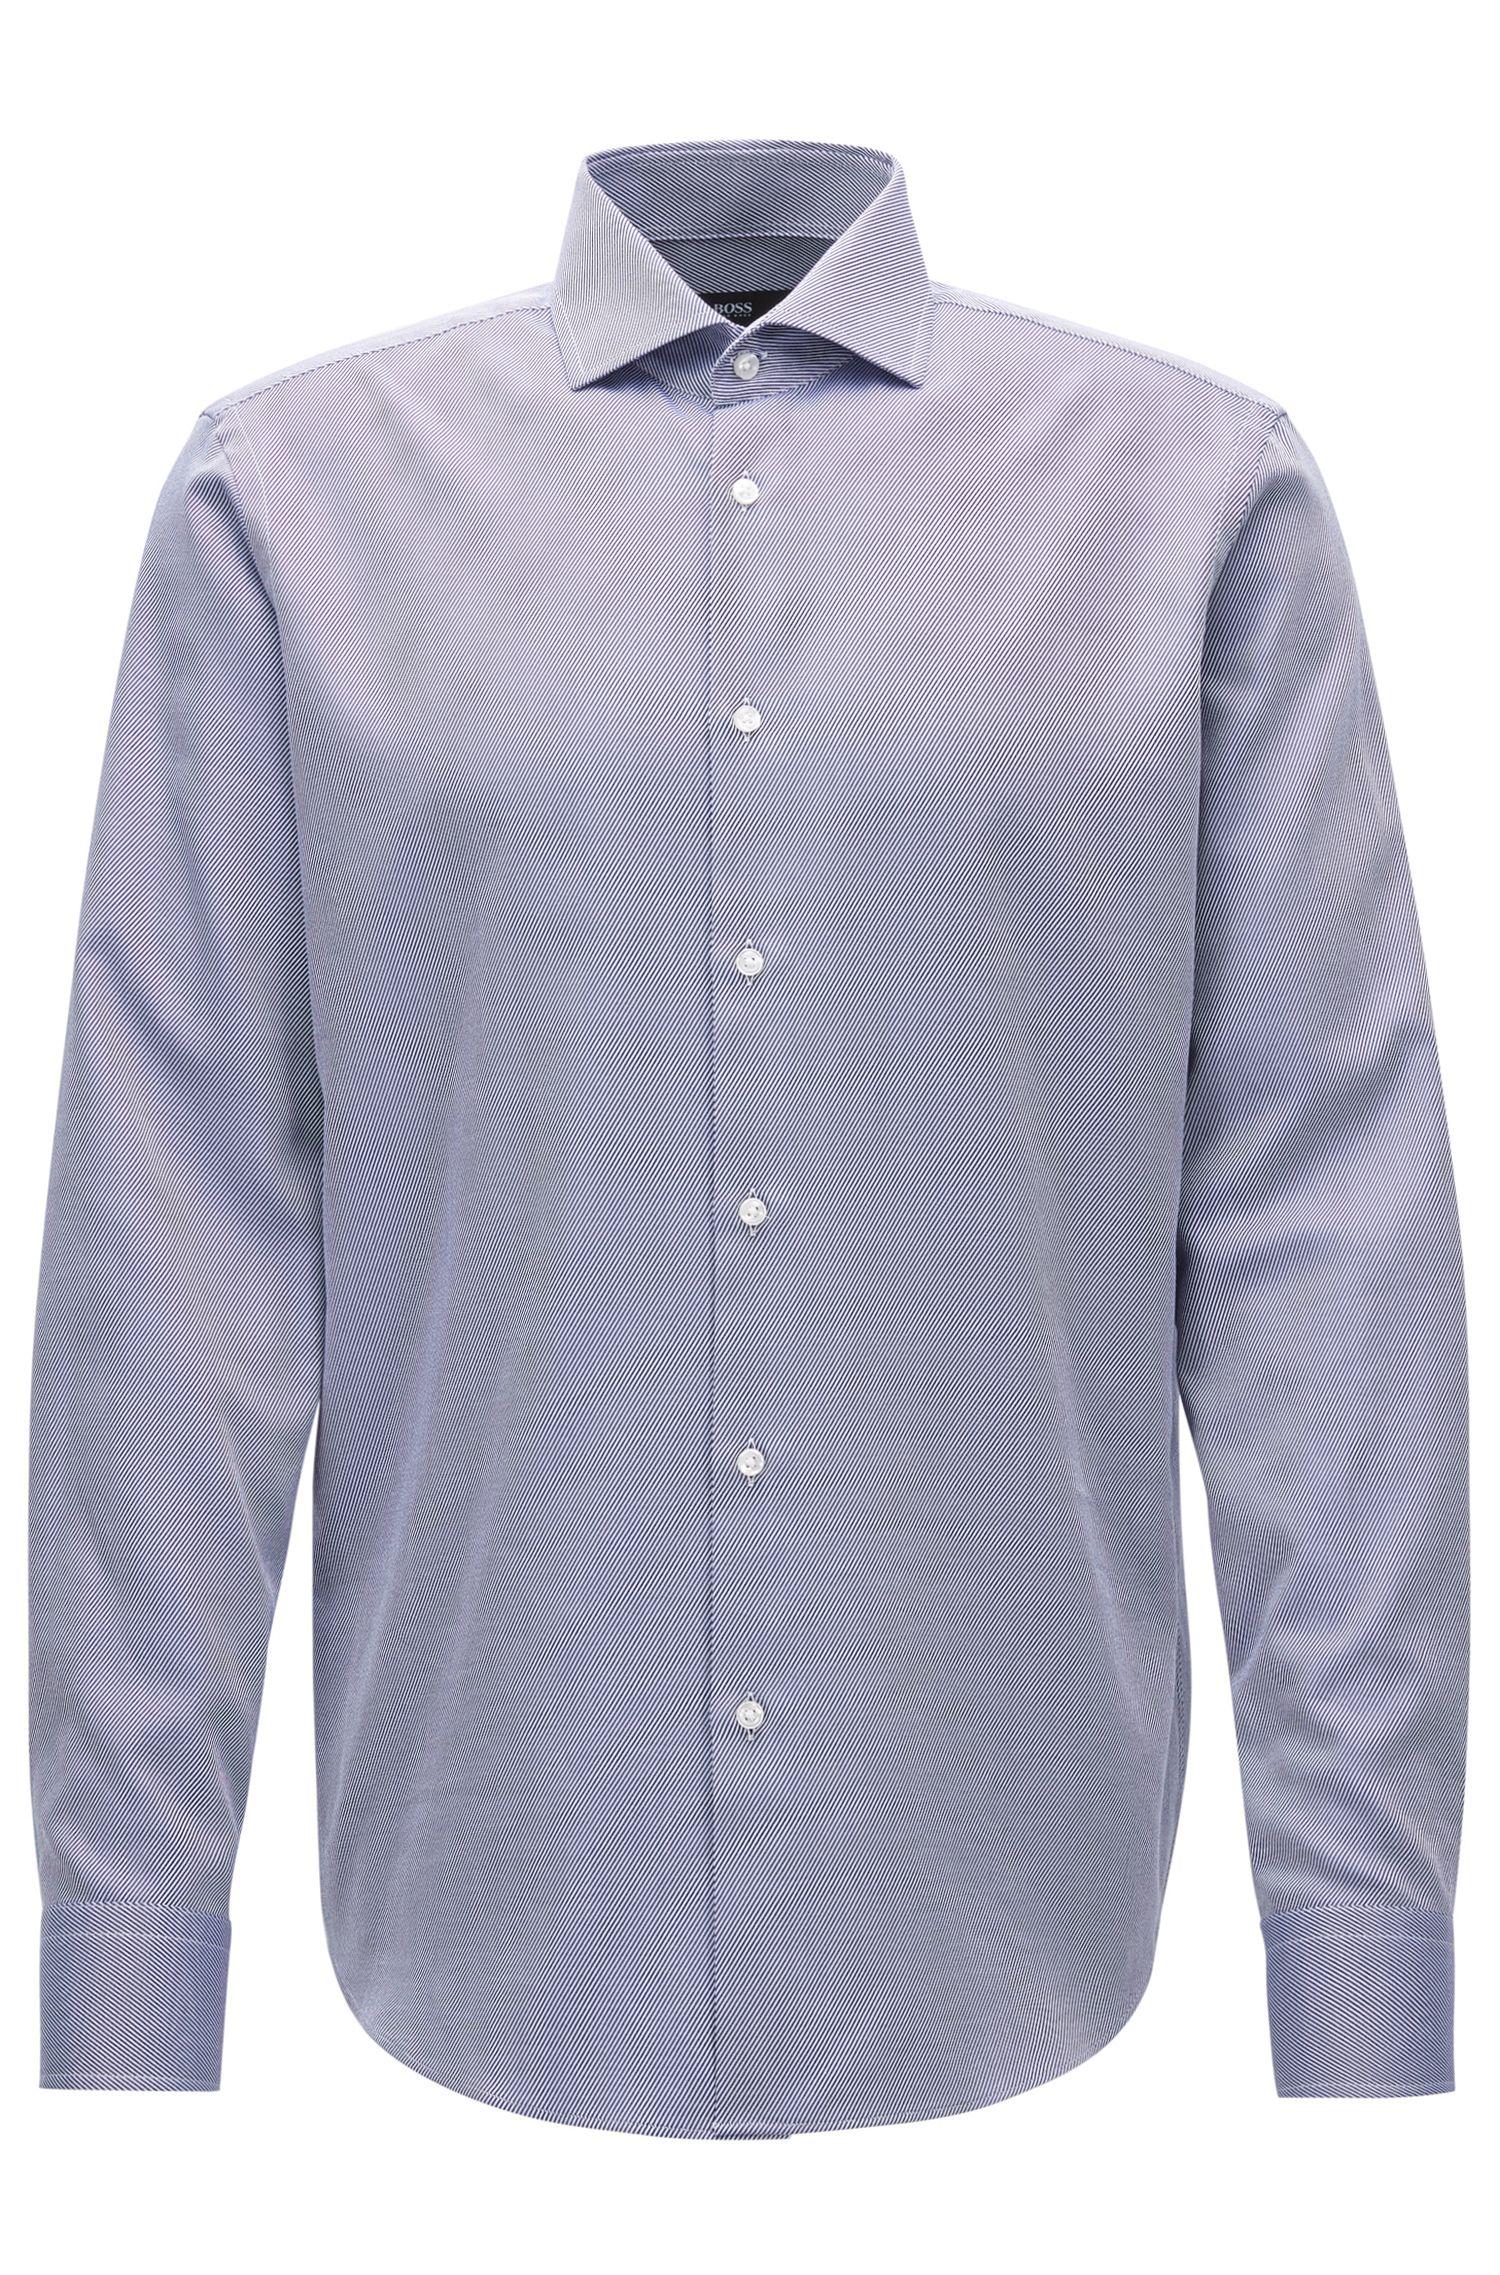 'Gordon' | Regular Fit, Cotton Twill Dress Shirt